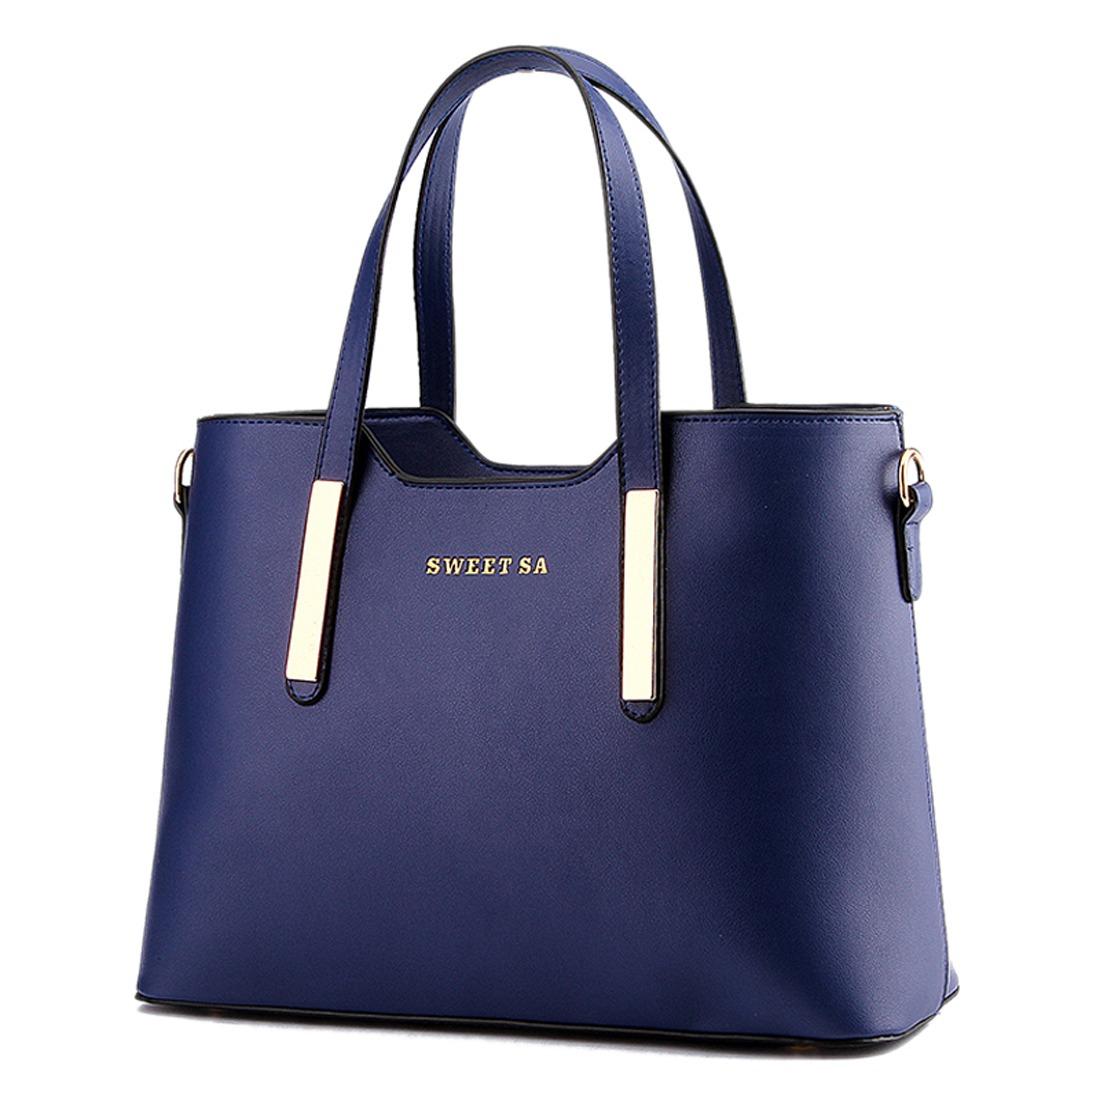 Korea Women Handbag Messenger Shoulder Crossbody Tote Exquisite Faux leather Bag